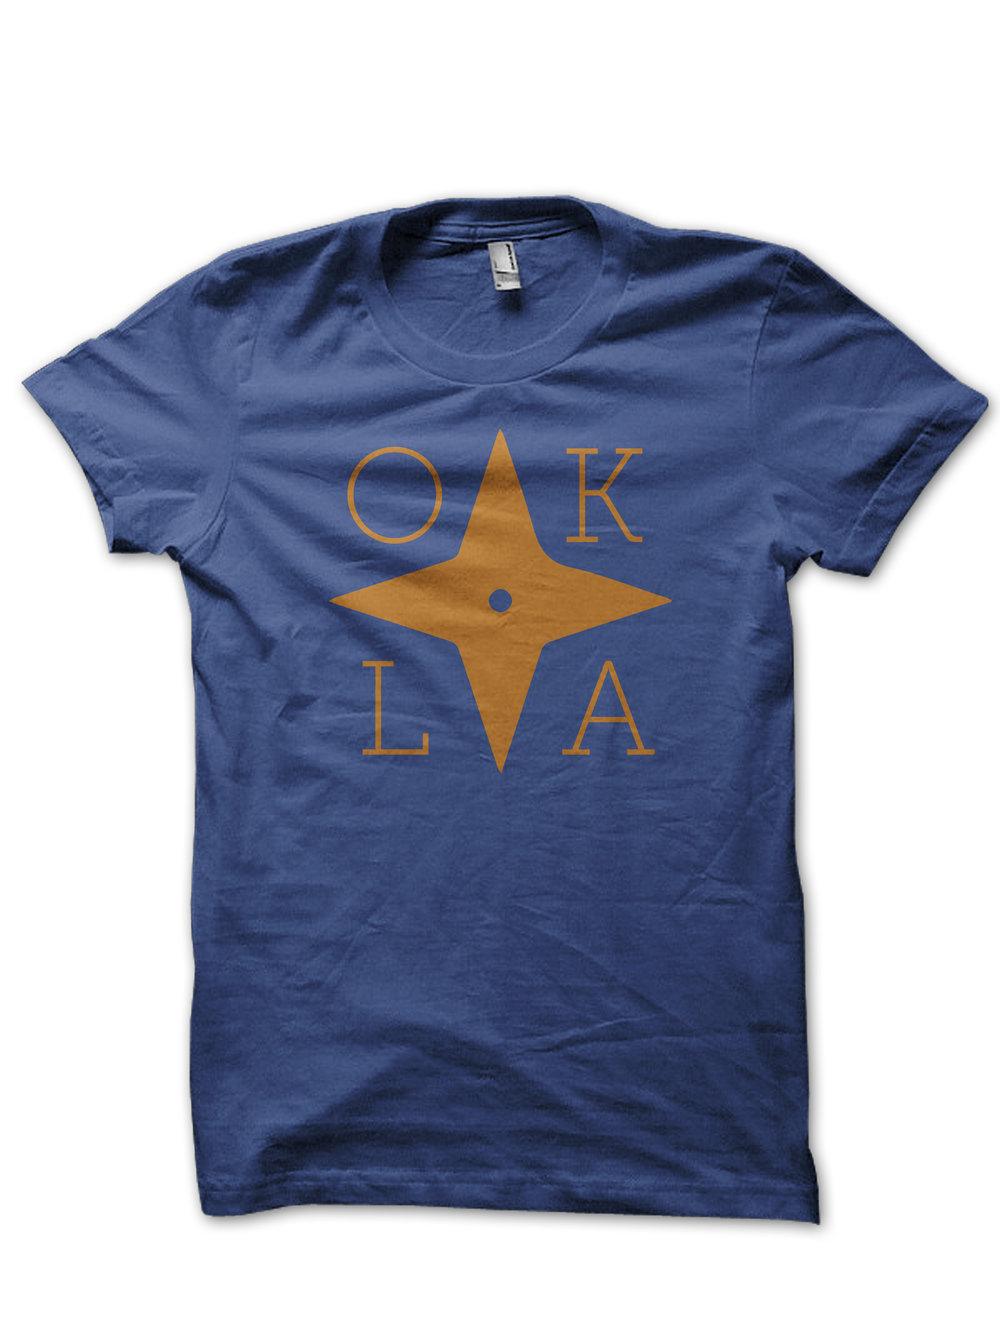 OKLA shuriken shirt.jpg